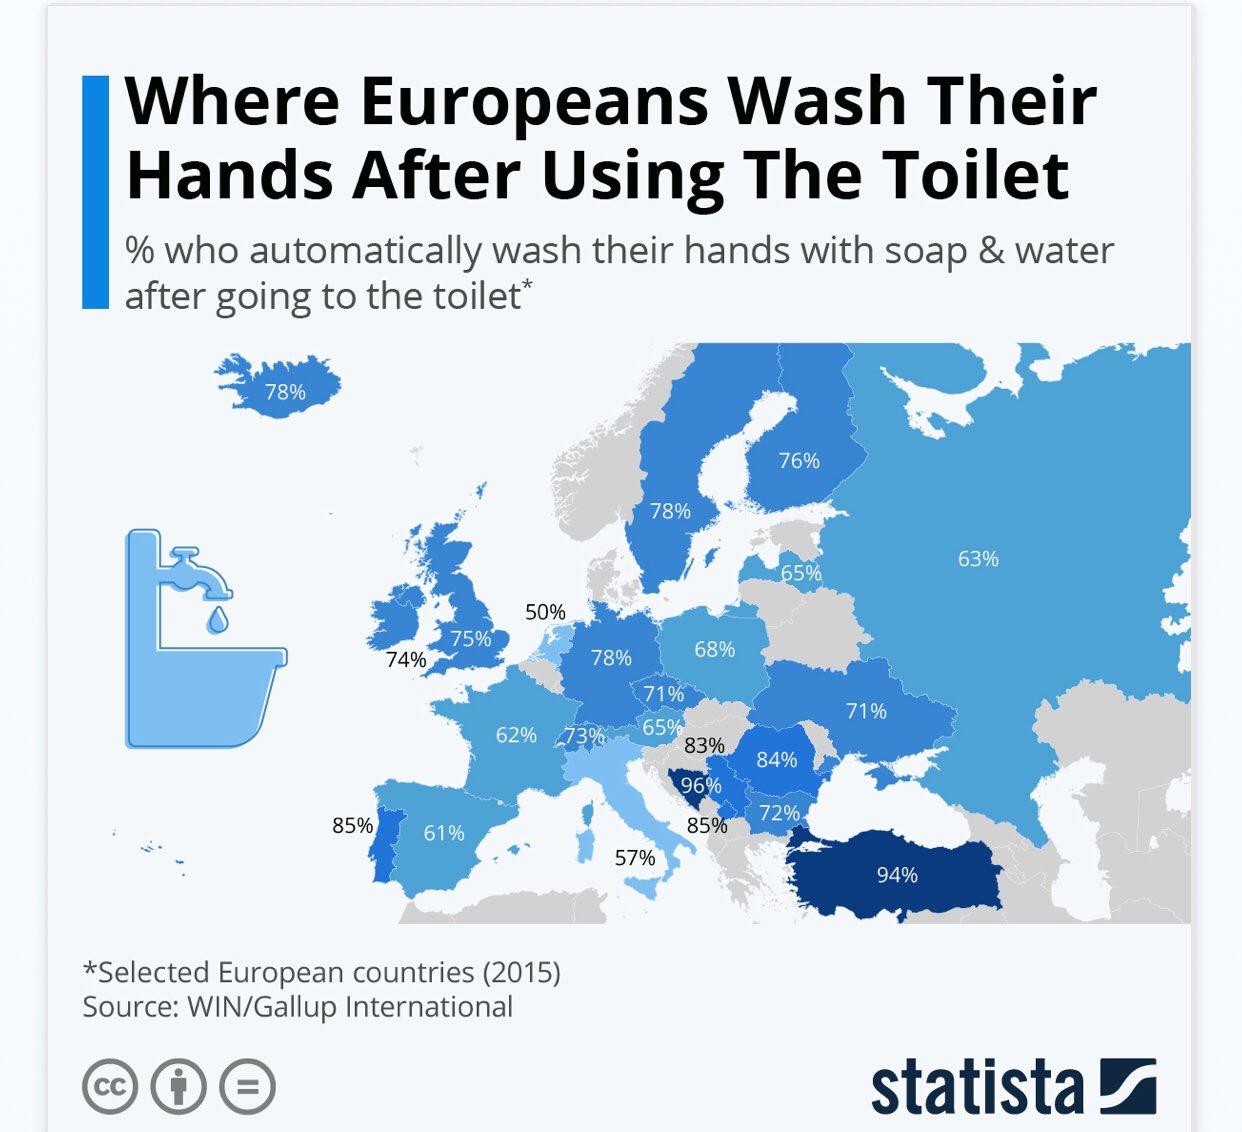 chi si lava le mani in europa coronavirus